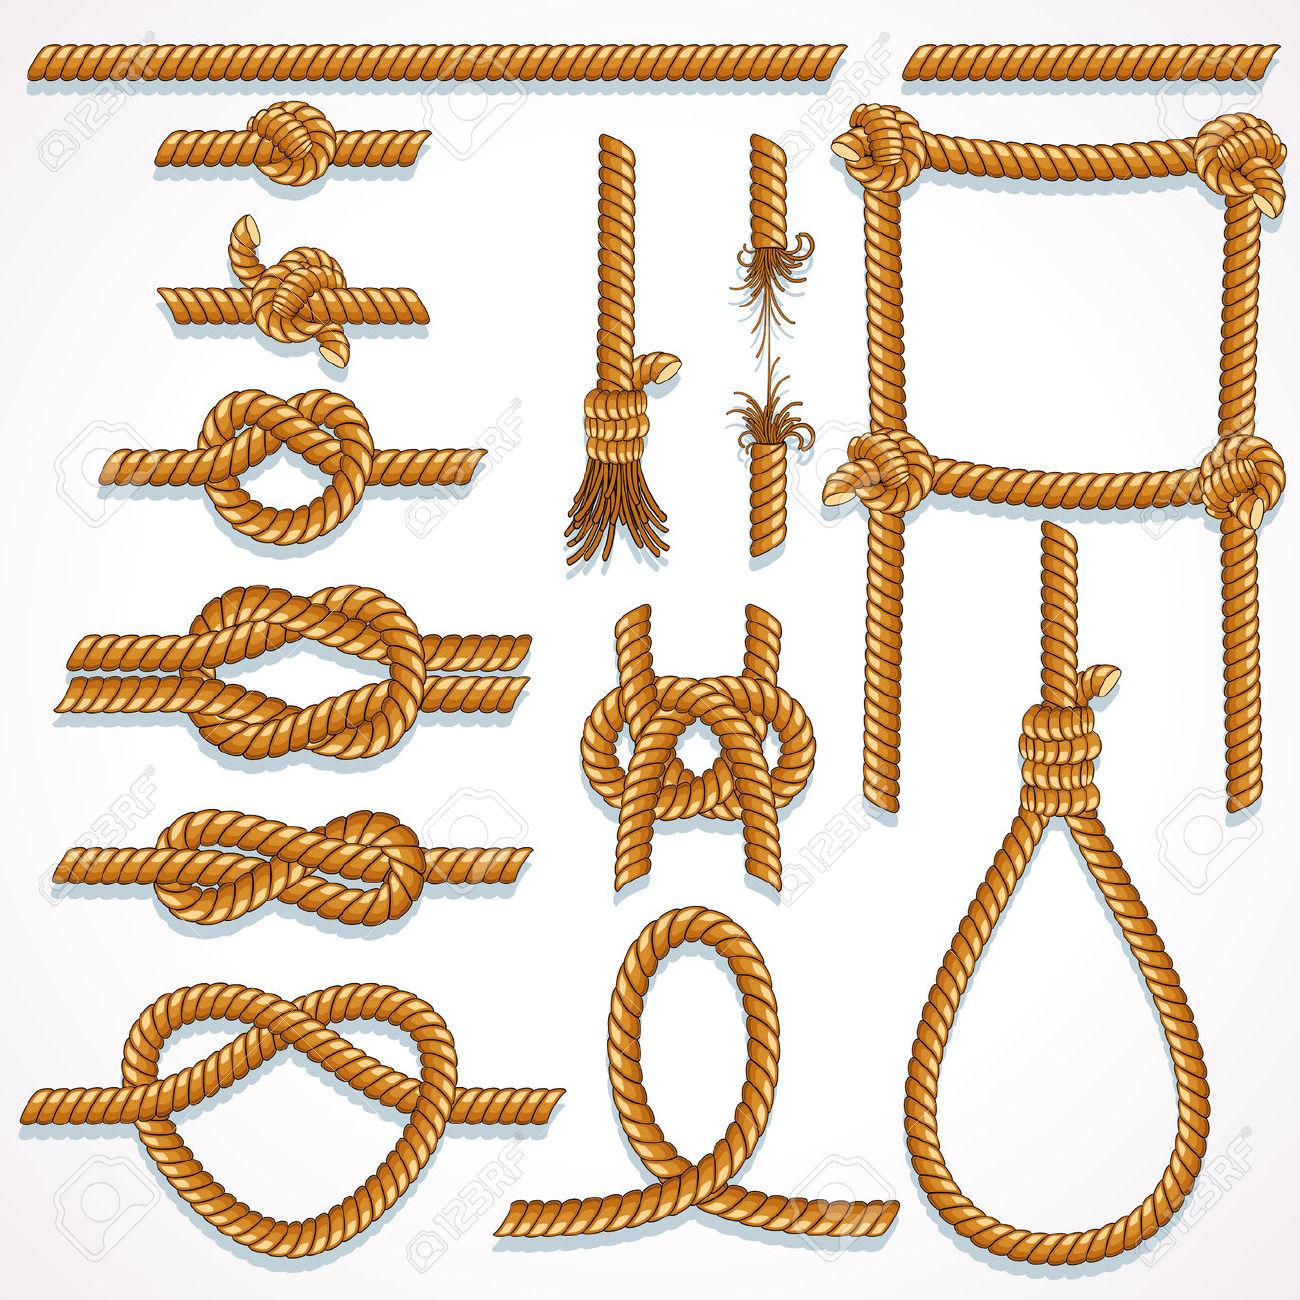 Rope Design Illustrations.